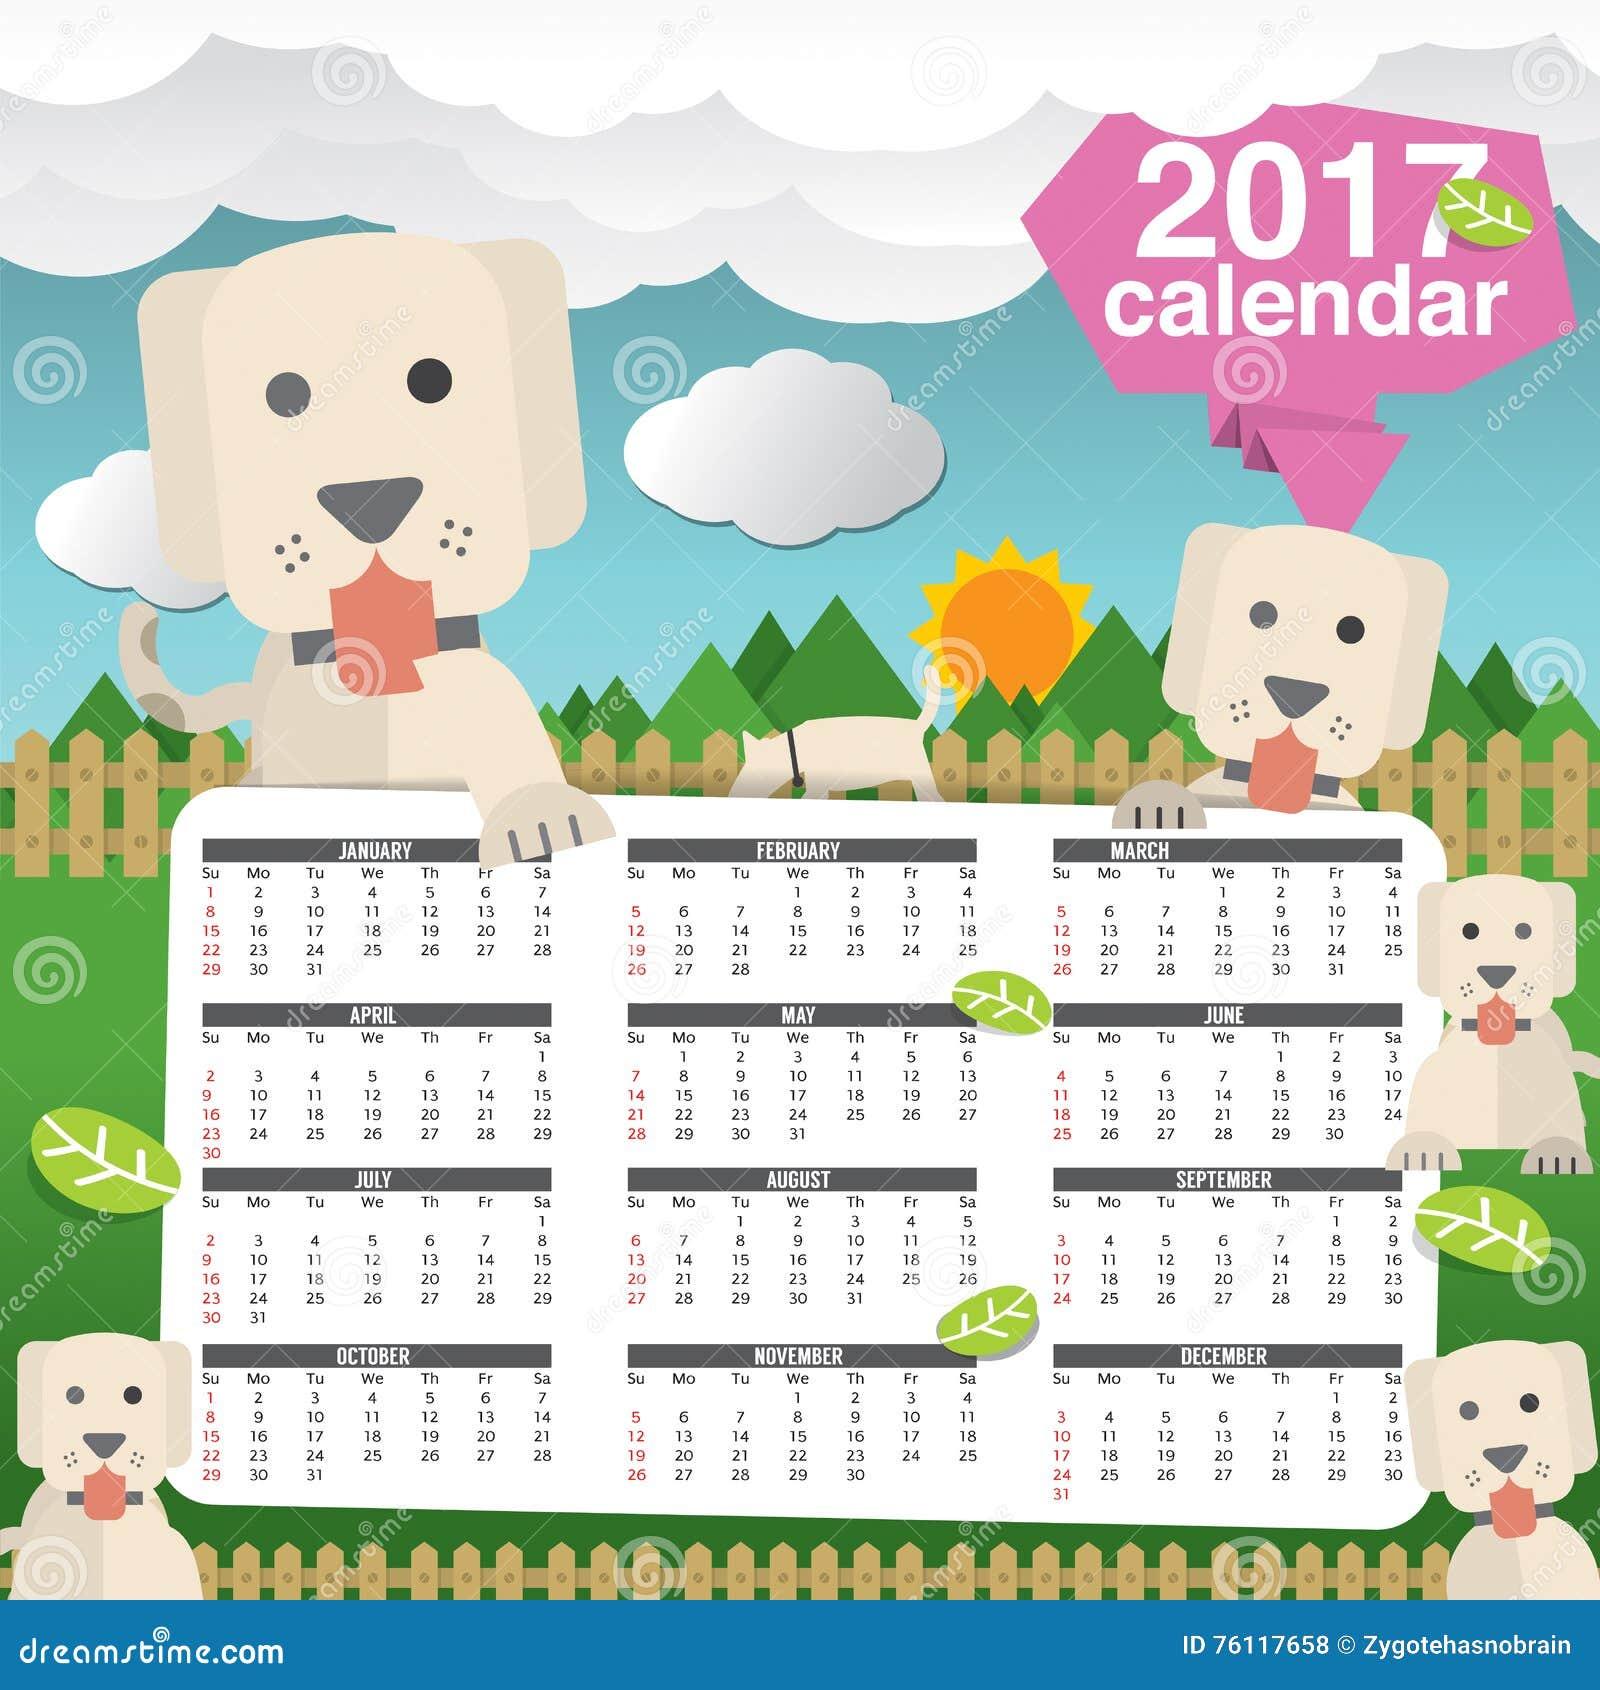 Cute Calendar Illustration : Calendar starts sunday cute dogs in backyard stock